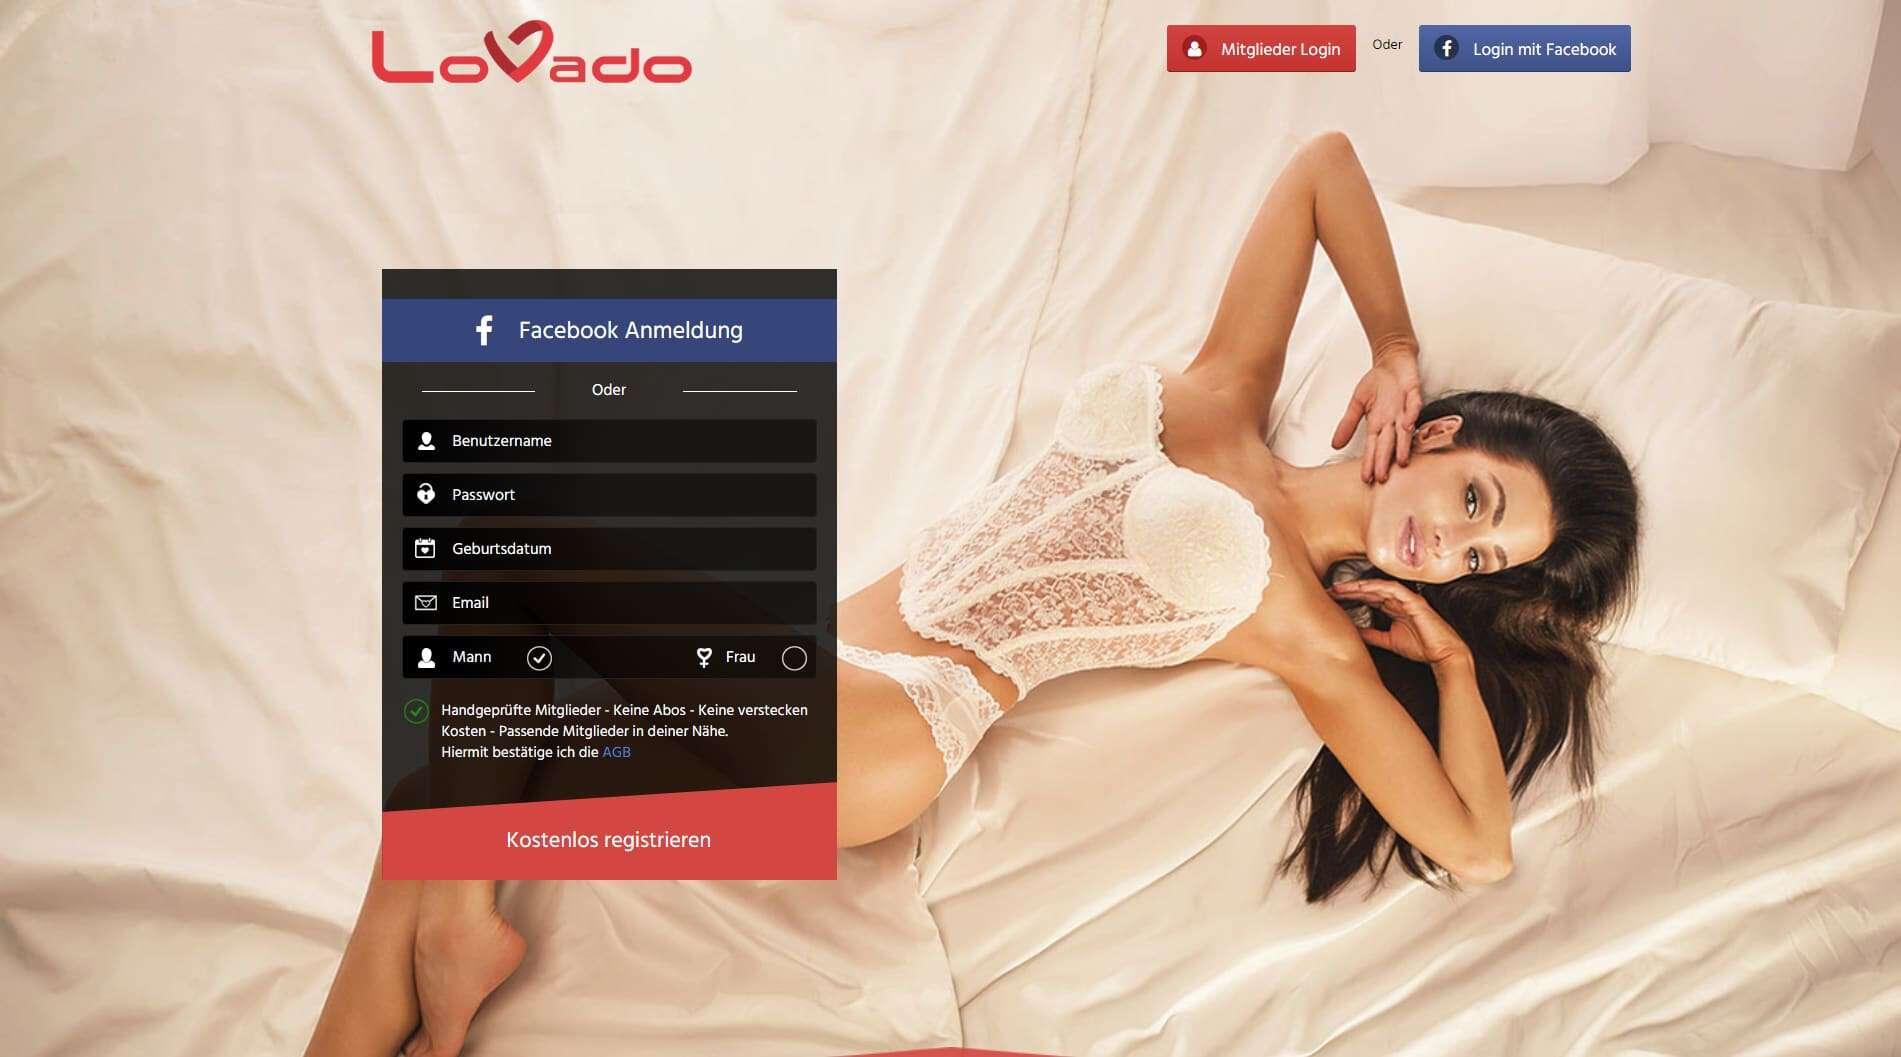 Lovado.net Abzocke